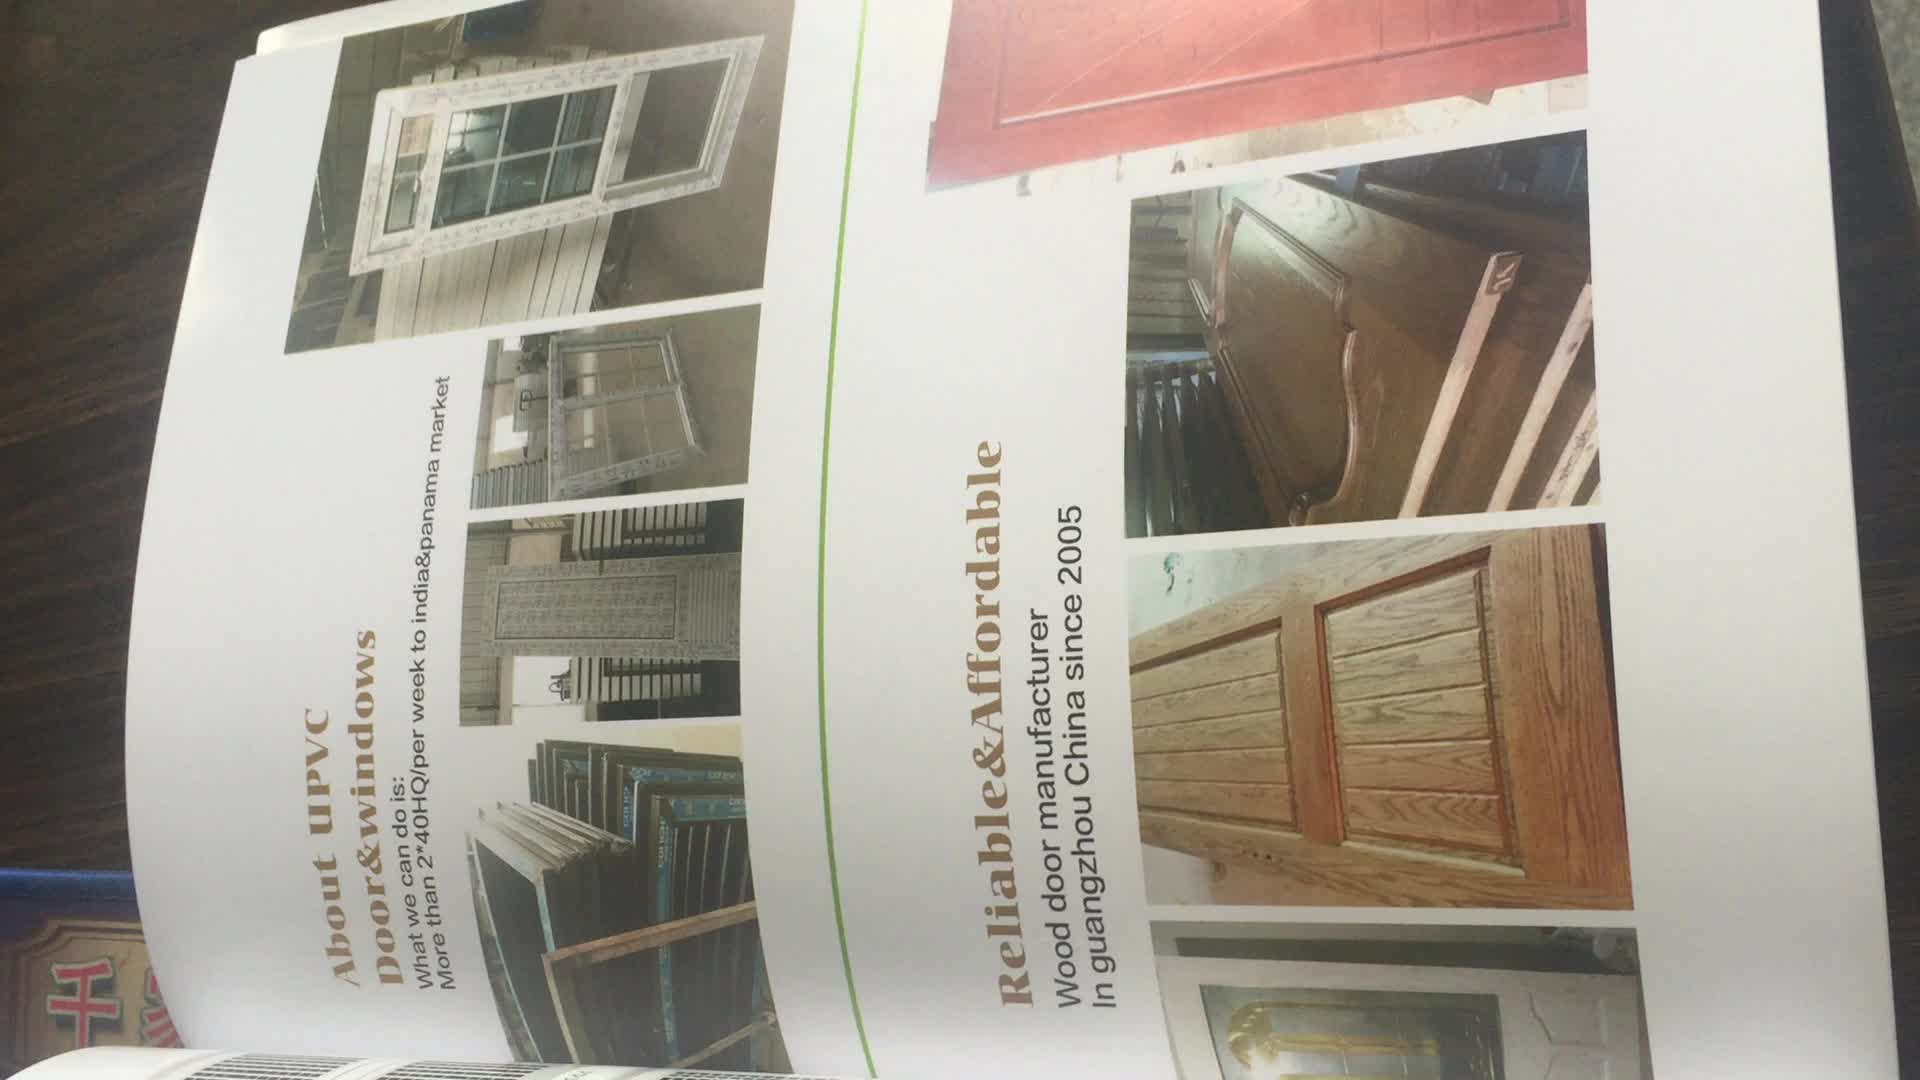 Bronze Main Gate Designs For Farm House - Buy Main Gate Design,Front ...